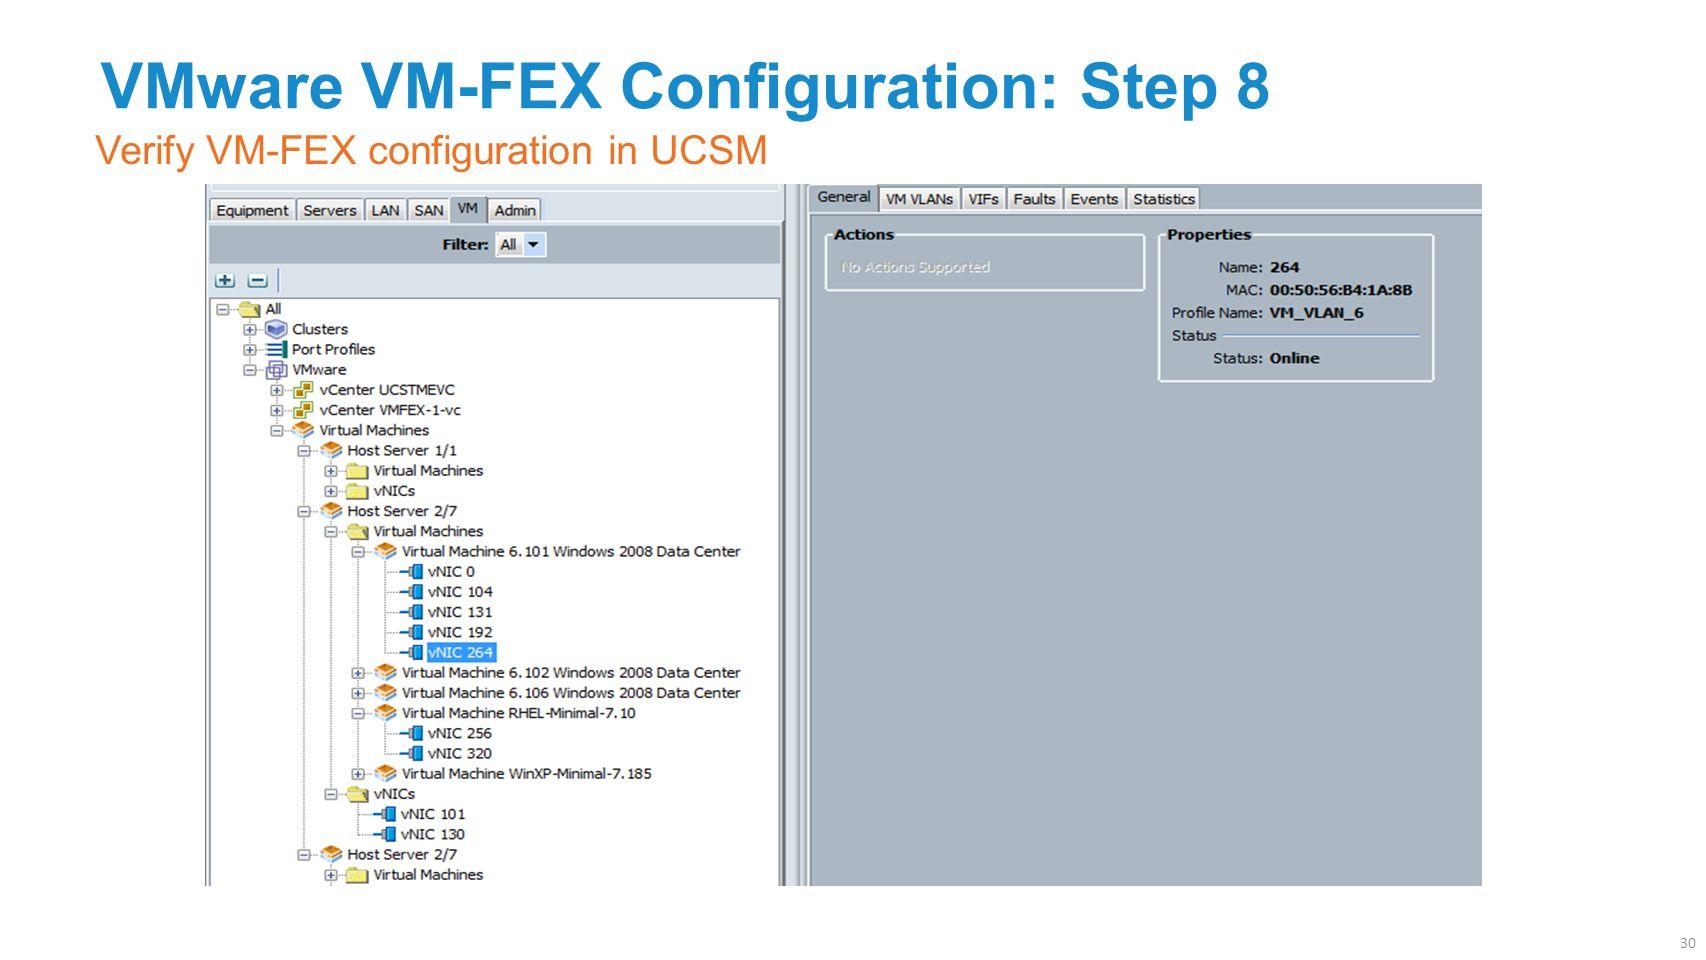 VMware VM-FEX Configuration: Step 8 Verify VM-FEX configuration in UCSM 30